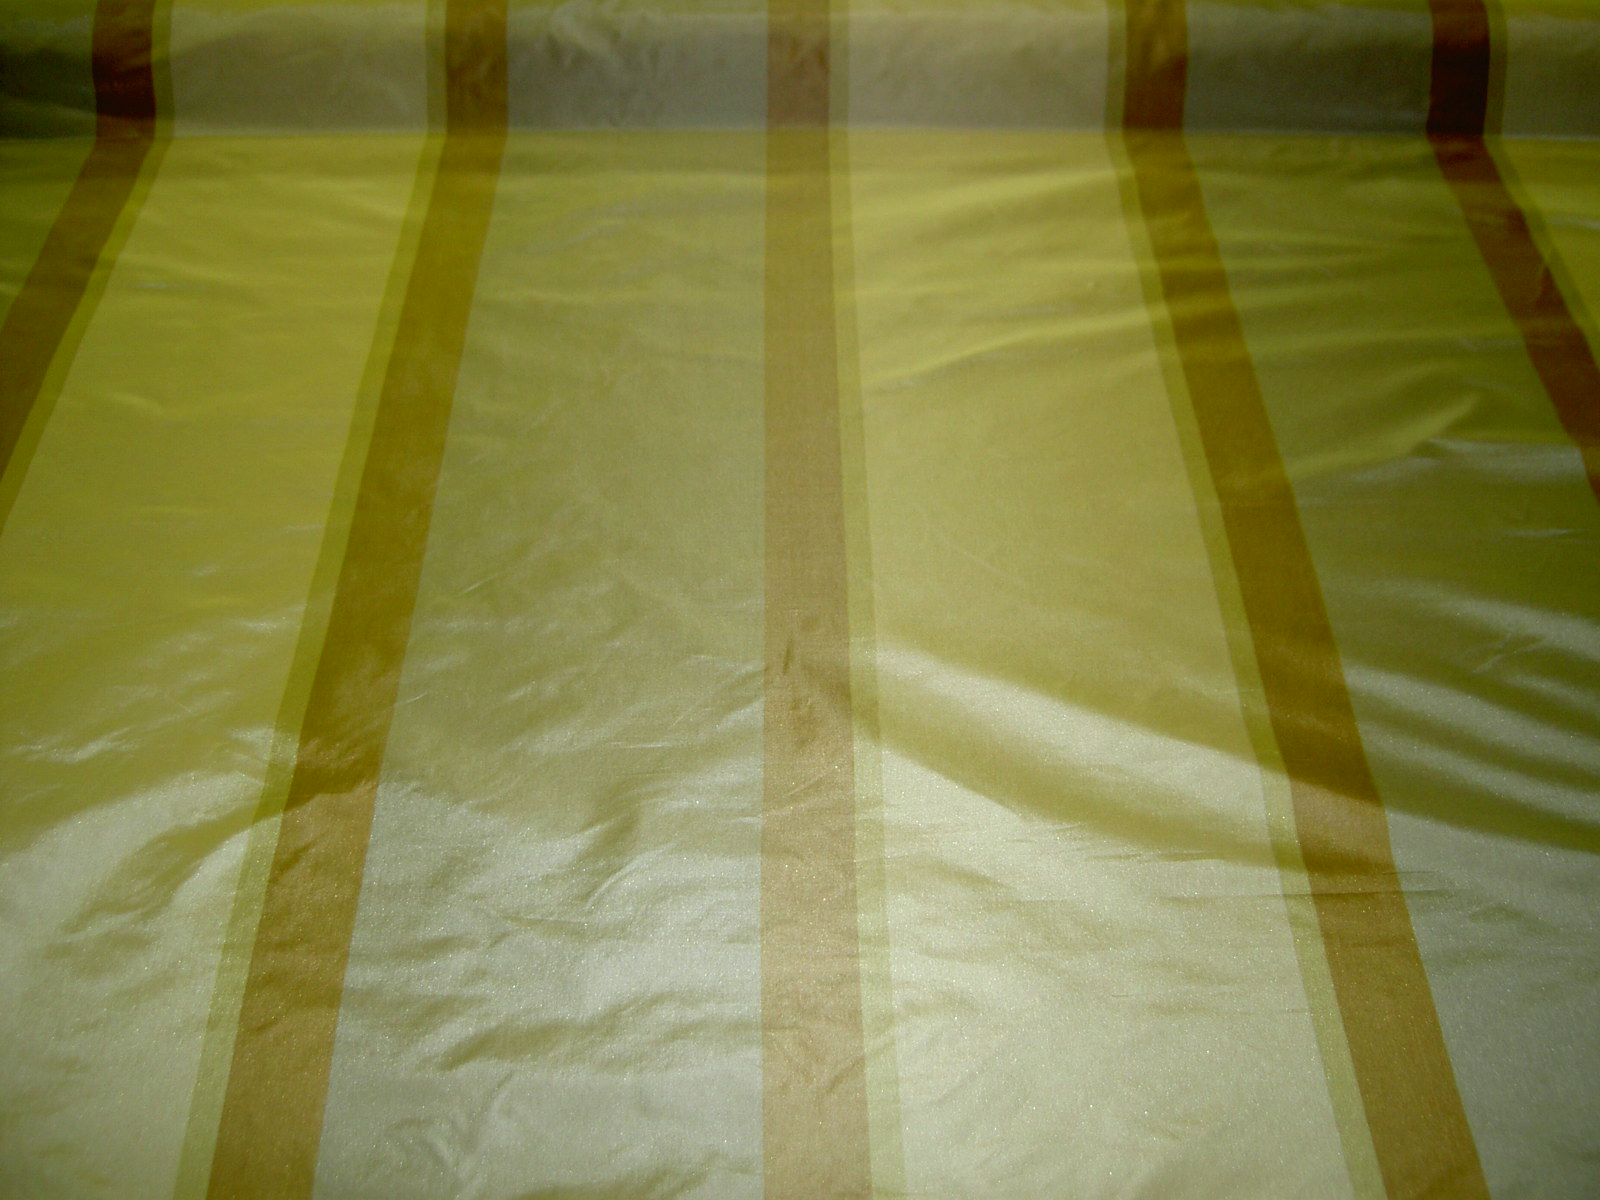 Libas silks color 5 16 stripe 100 silk home decor fabric s011907 002